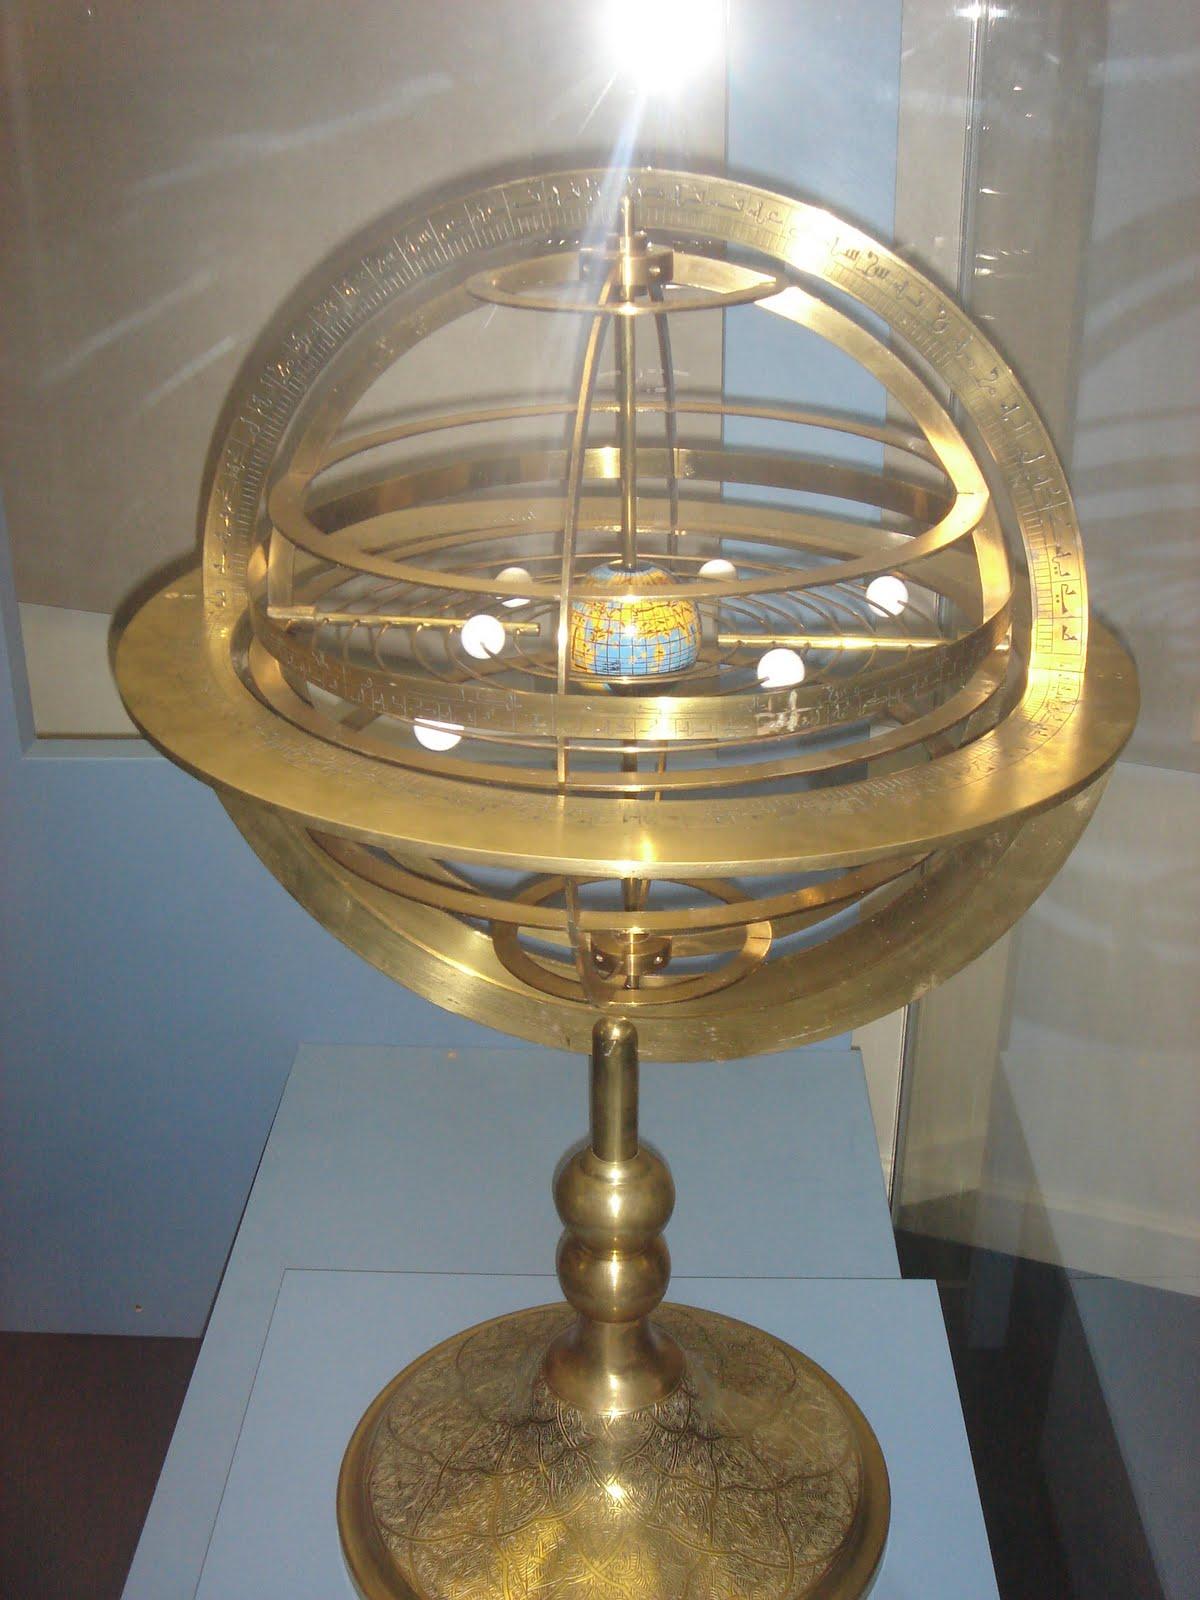 ancient astronomy tools - photo #9